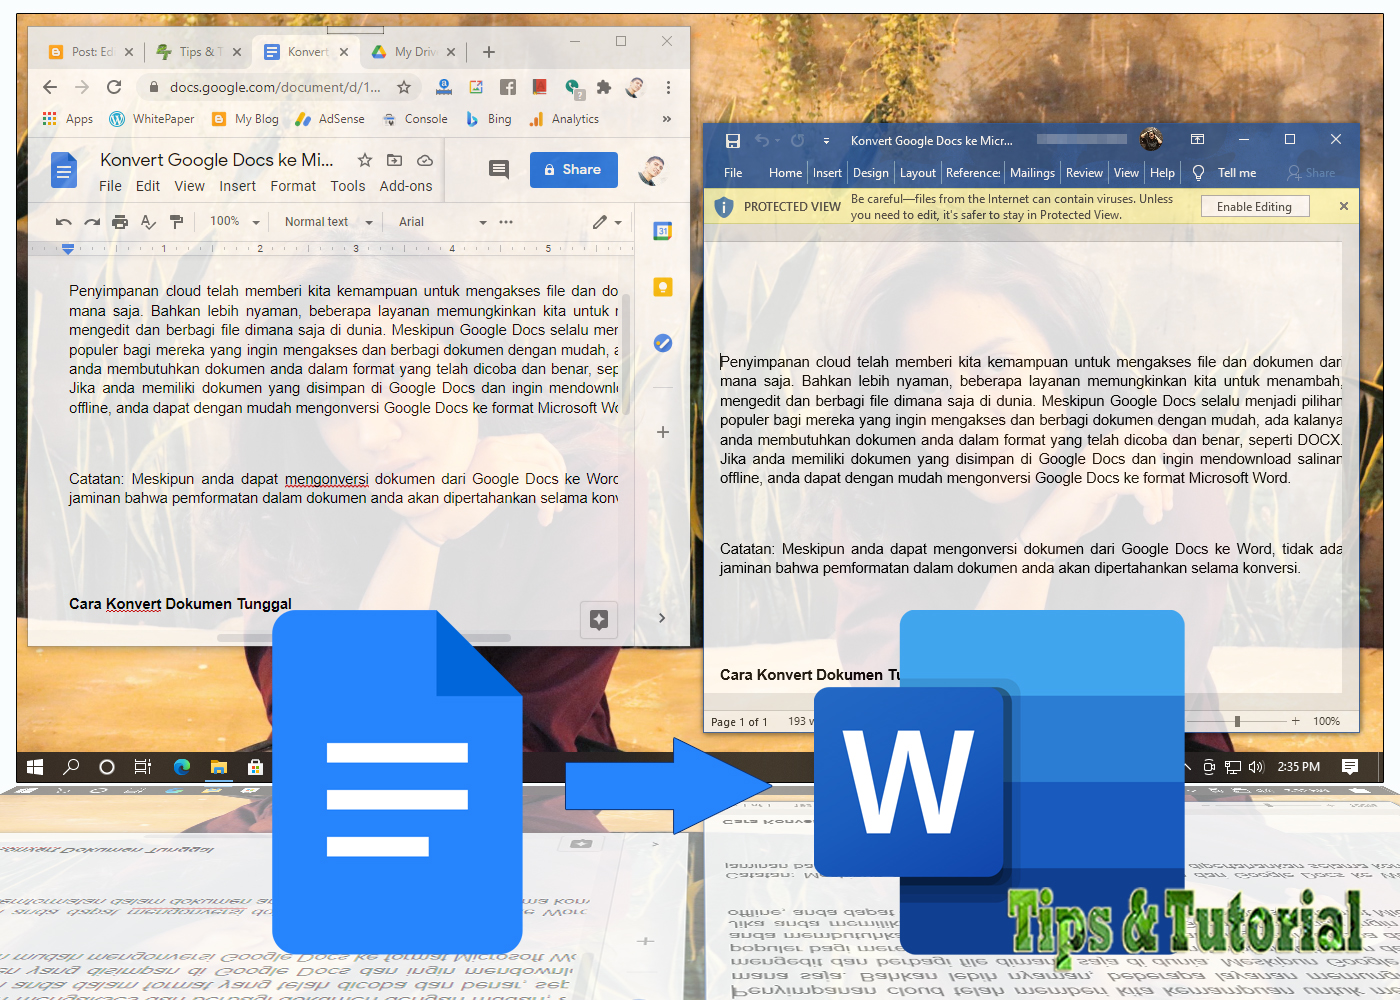 Cara Konvert Google Docs Ke Microsoft Word Tips Tutorial